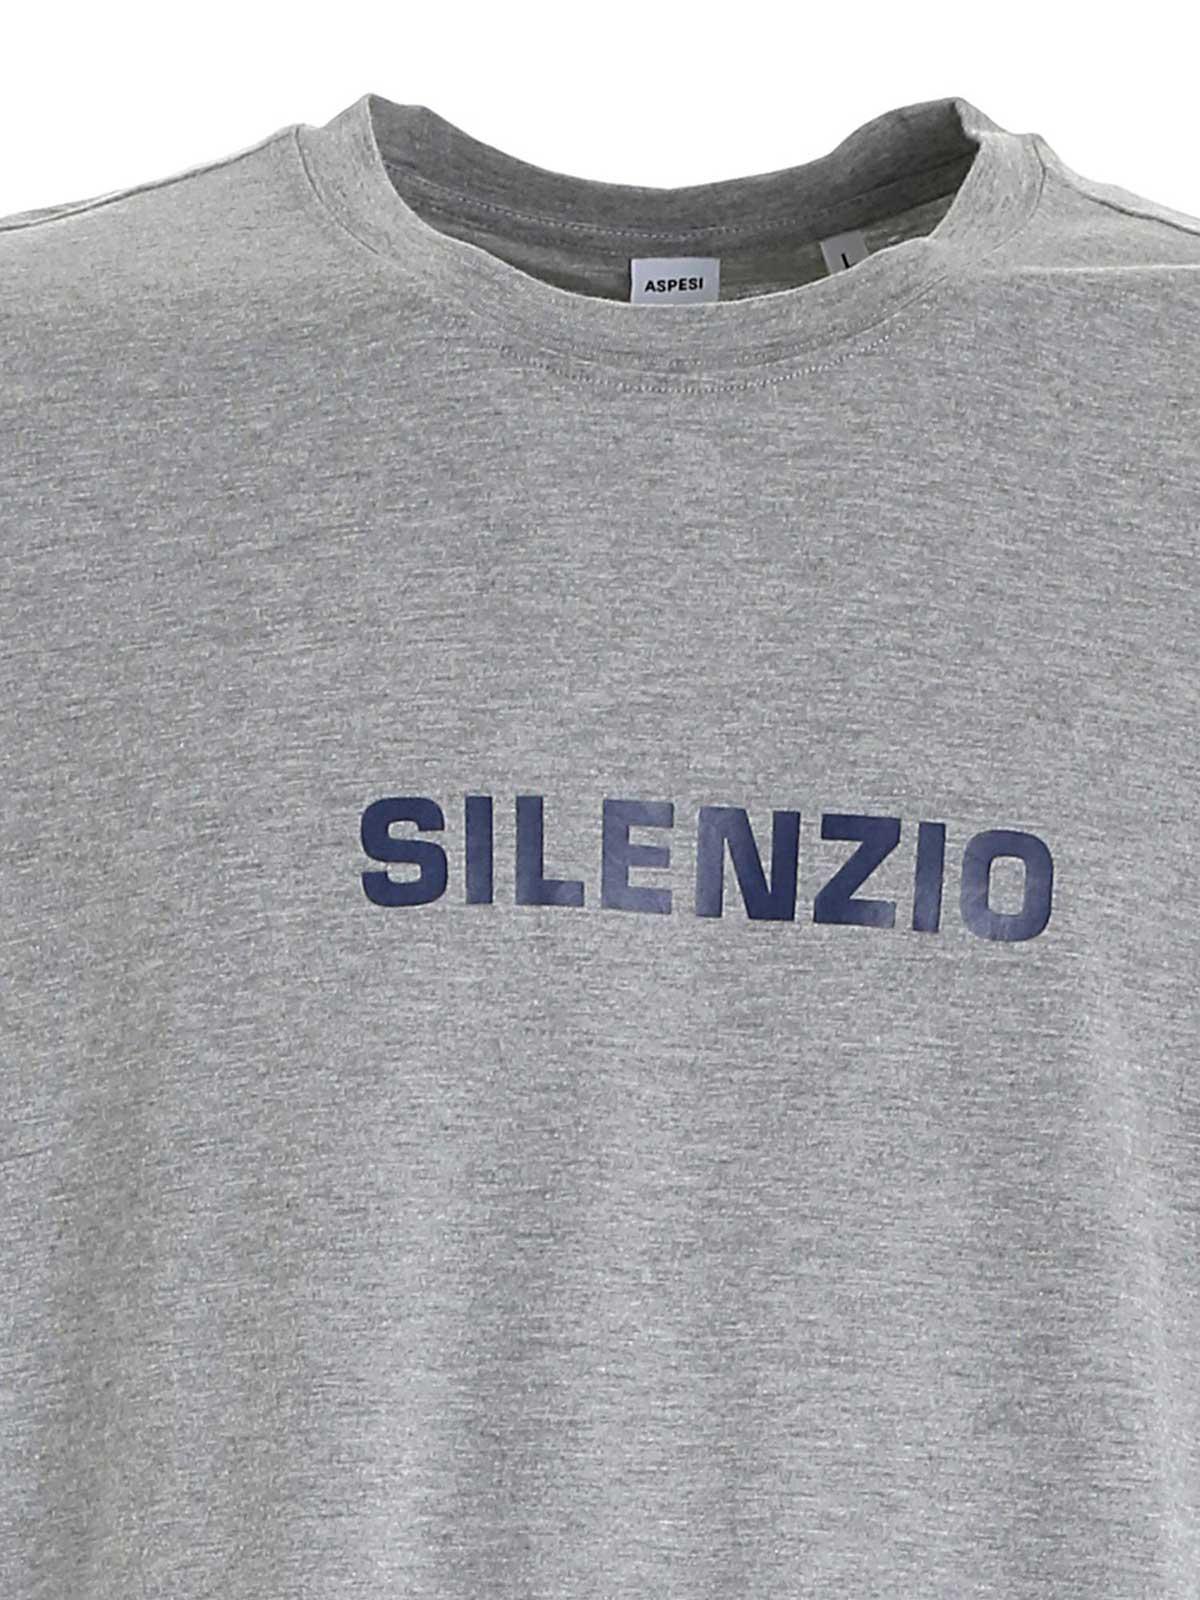 Picture of ASPESI | Men's Silenzio T-shirt